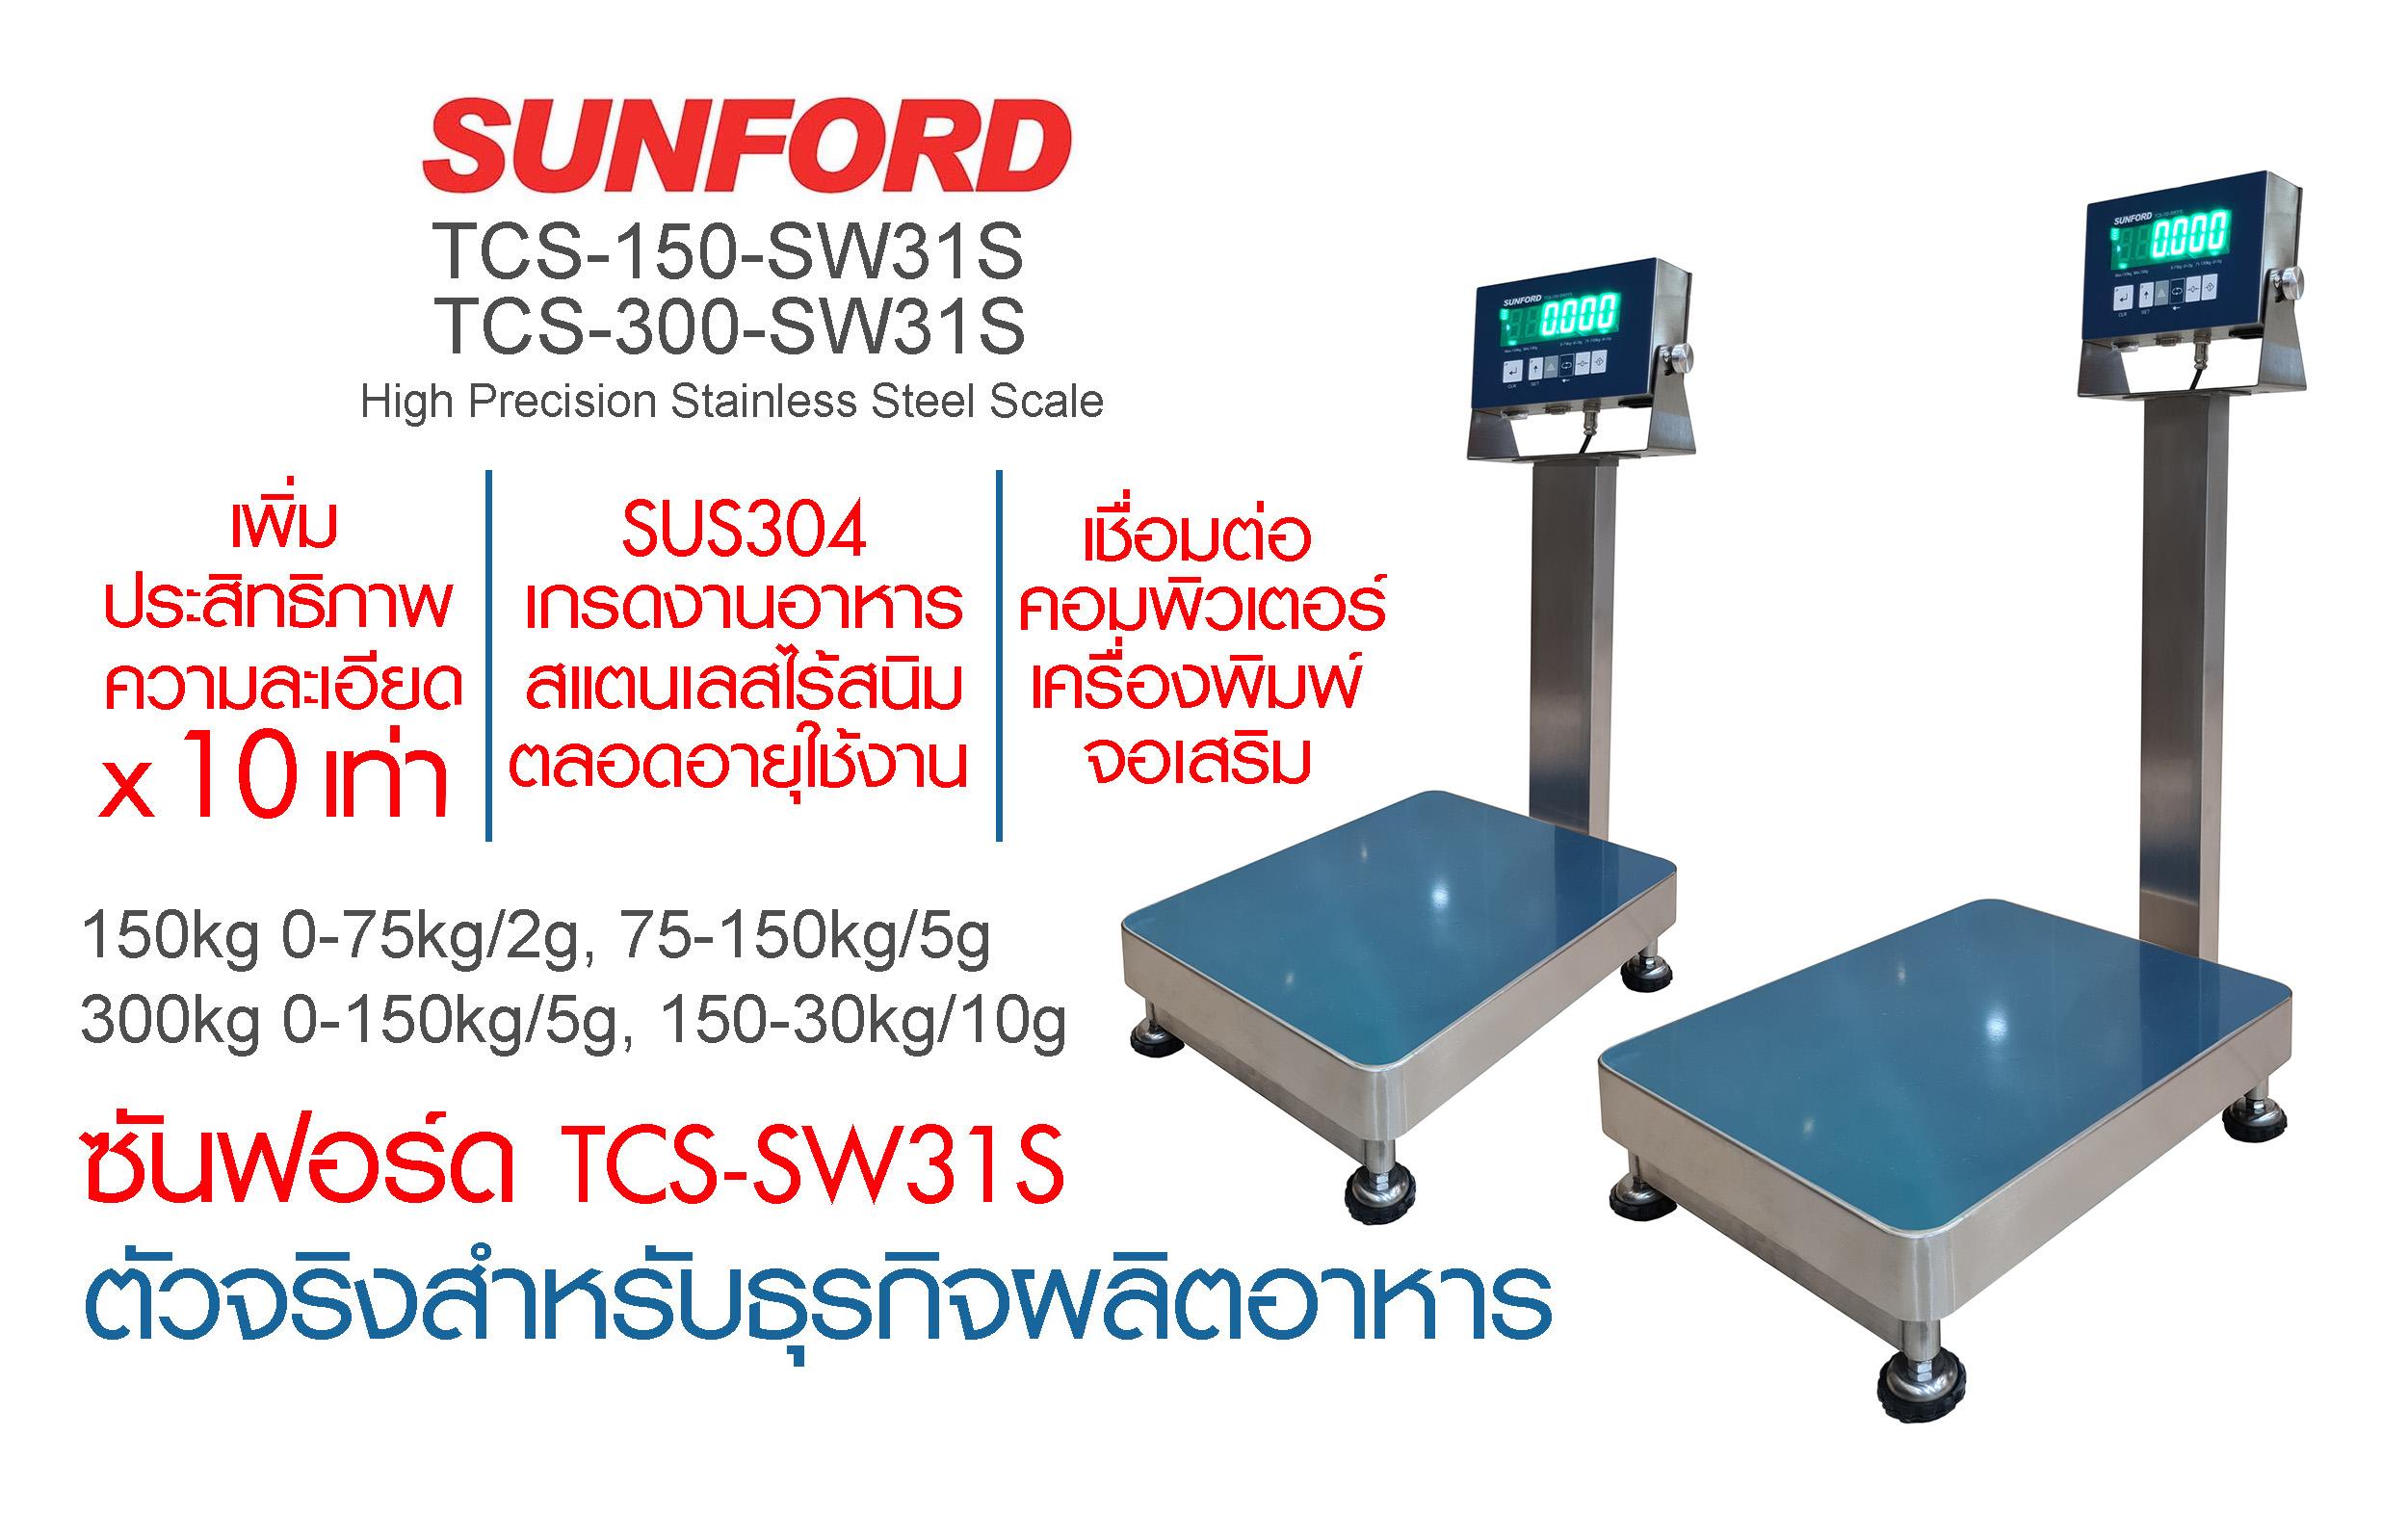 SUNFORD TCS-300-SW31S